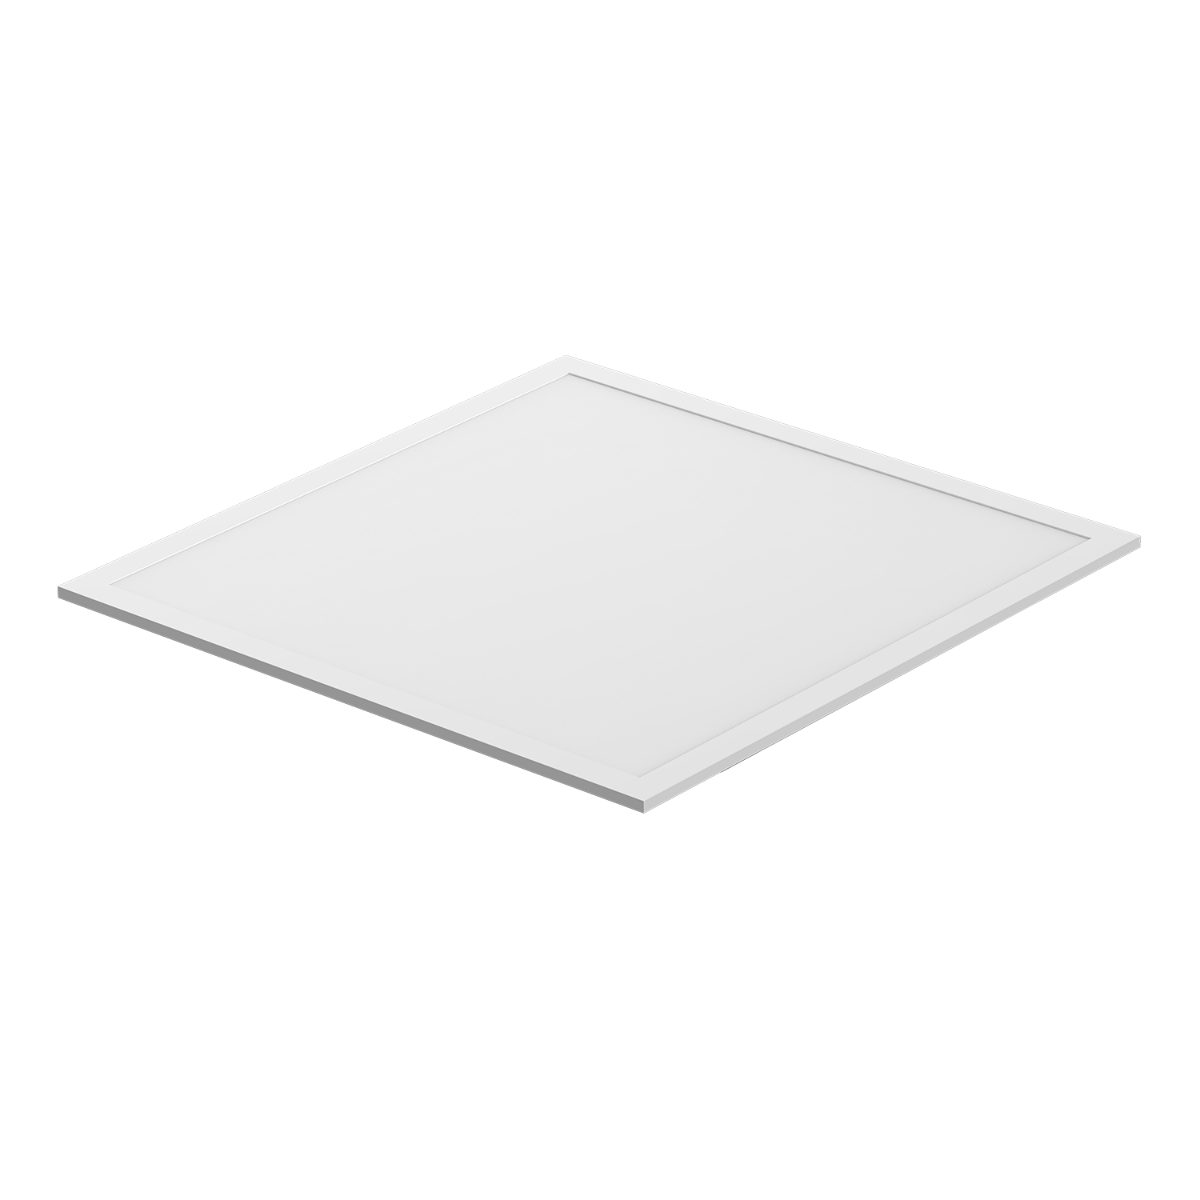 Noxion LED Panel Econox 32W 60x60cm 4000K 4400lm UGR <22 | Replacer for 4x18W